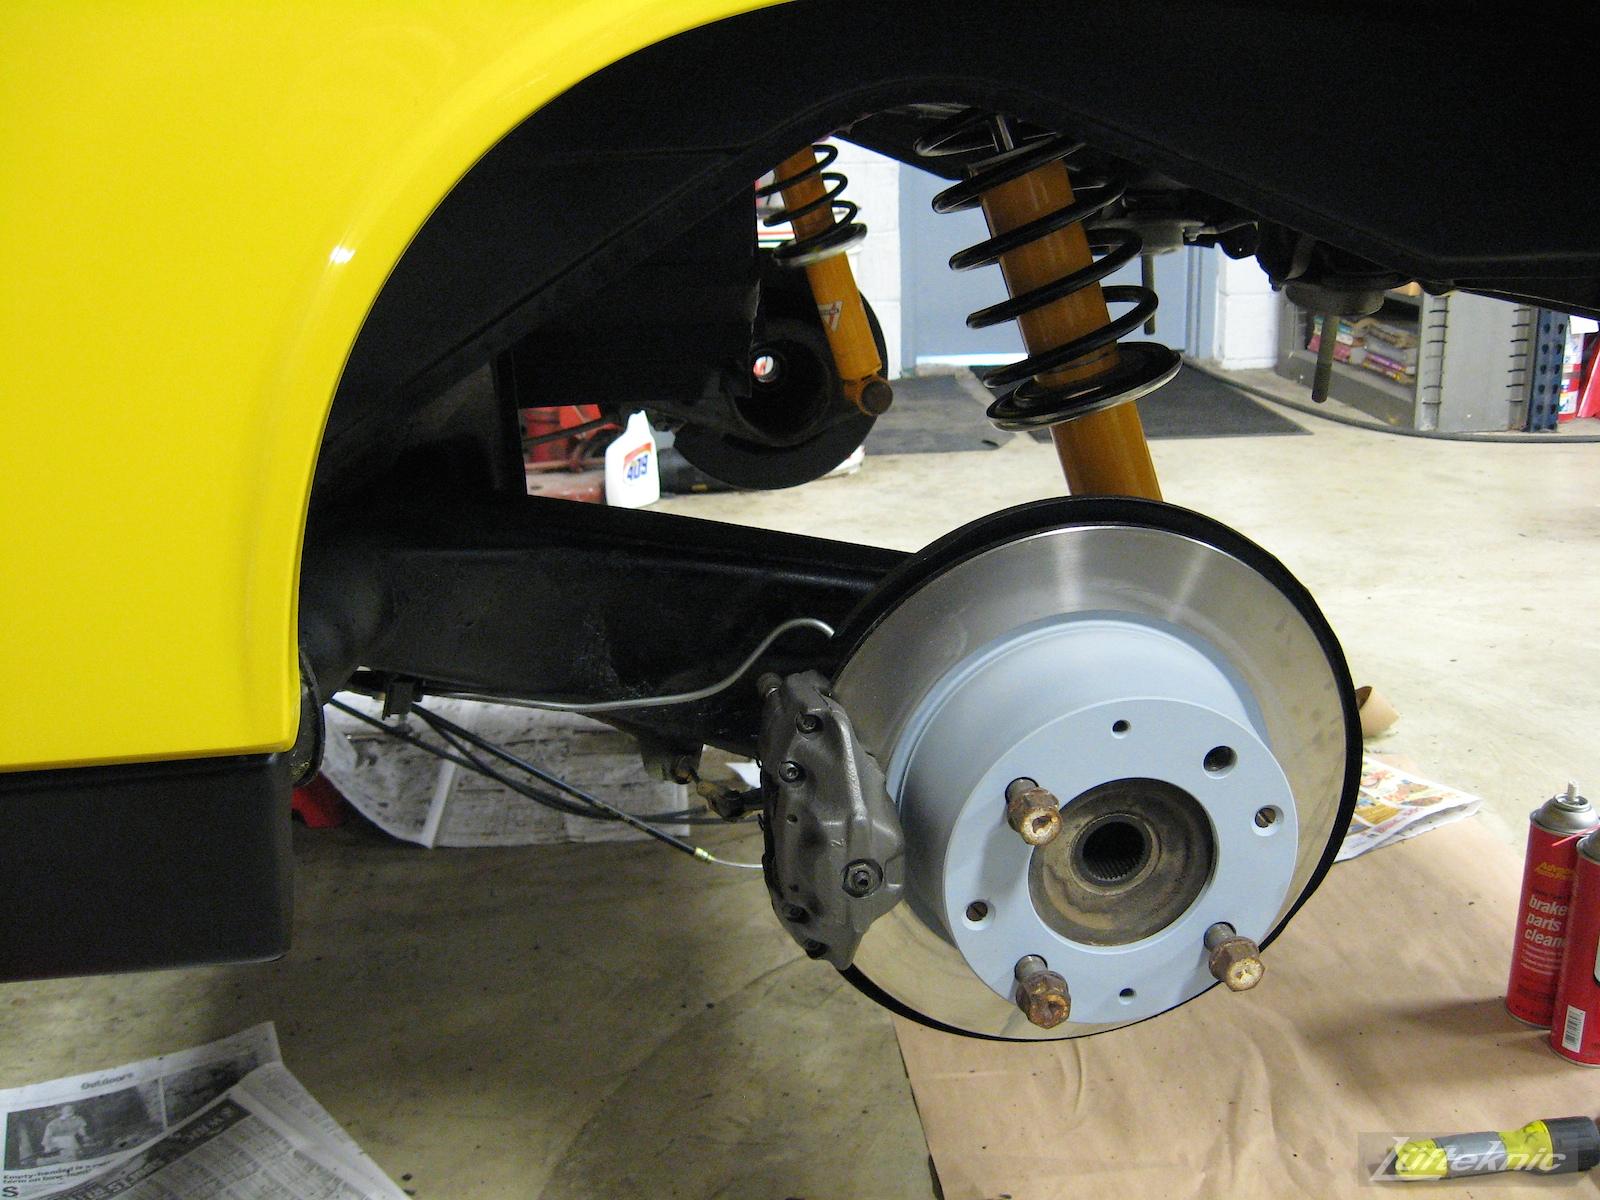 Fresh rear brakes for a restored yellow Porsche 914 at Lufteknic.